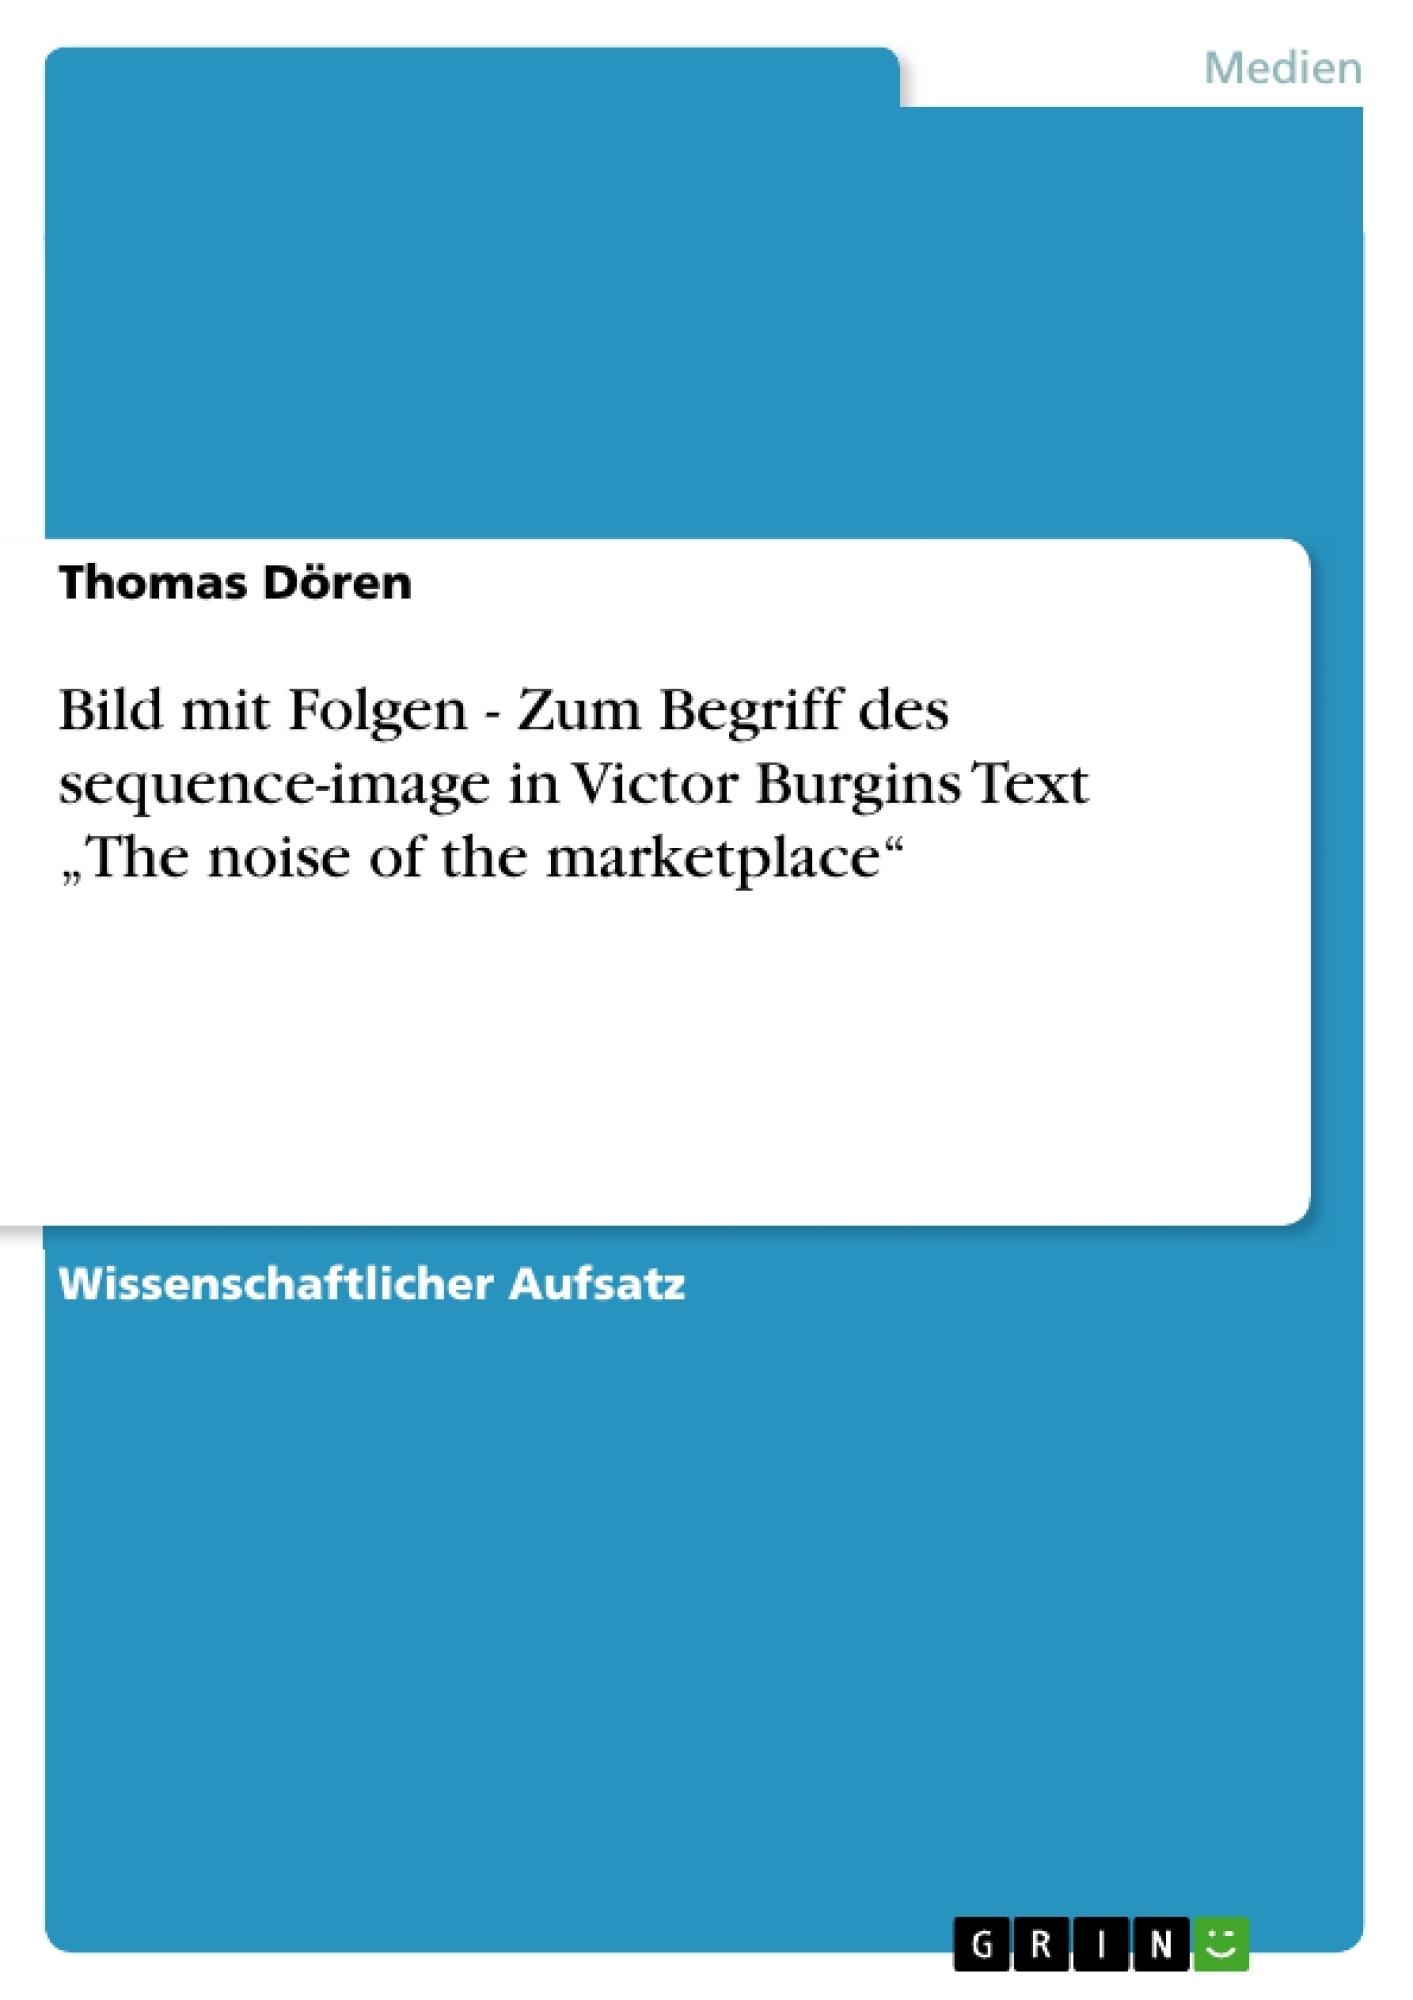 "Titel: Bild mit Folgen - Zum Begriff des sequence-image in Victor Burgins Text ""The noise of the marketplace"""